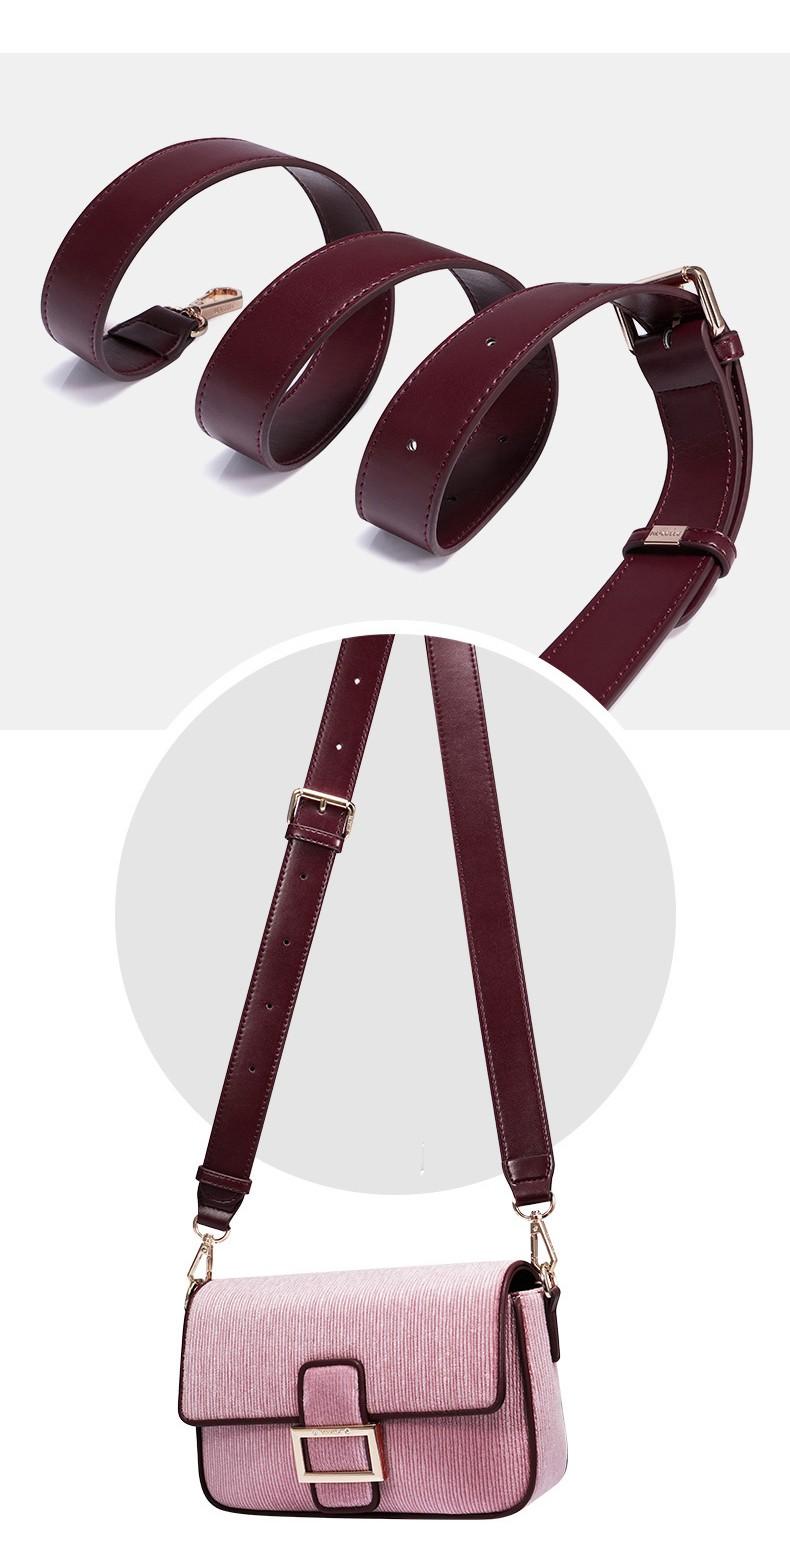 Túi đeo chéo nữ thời trang Nucelle Virgo VG528